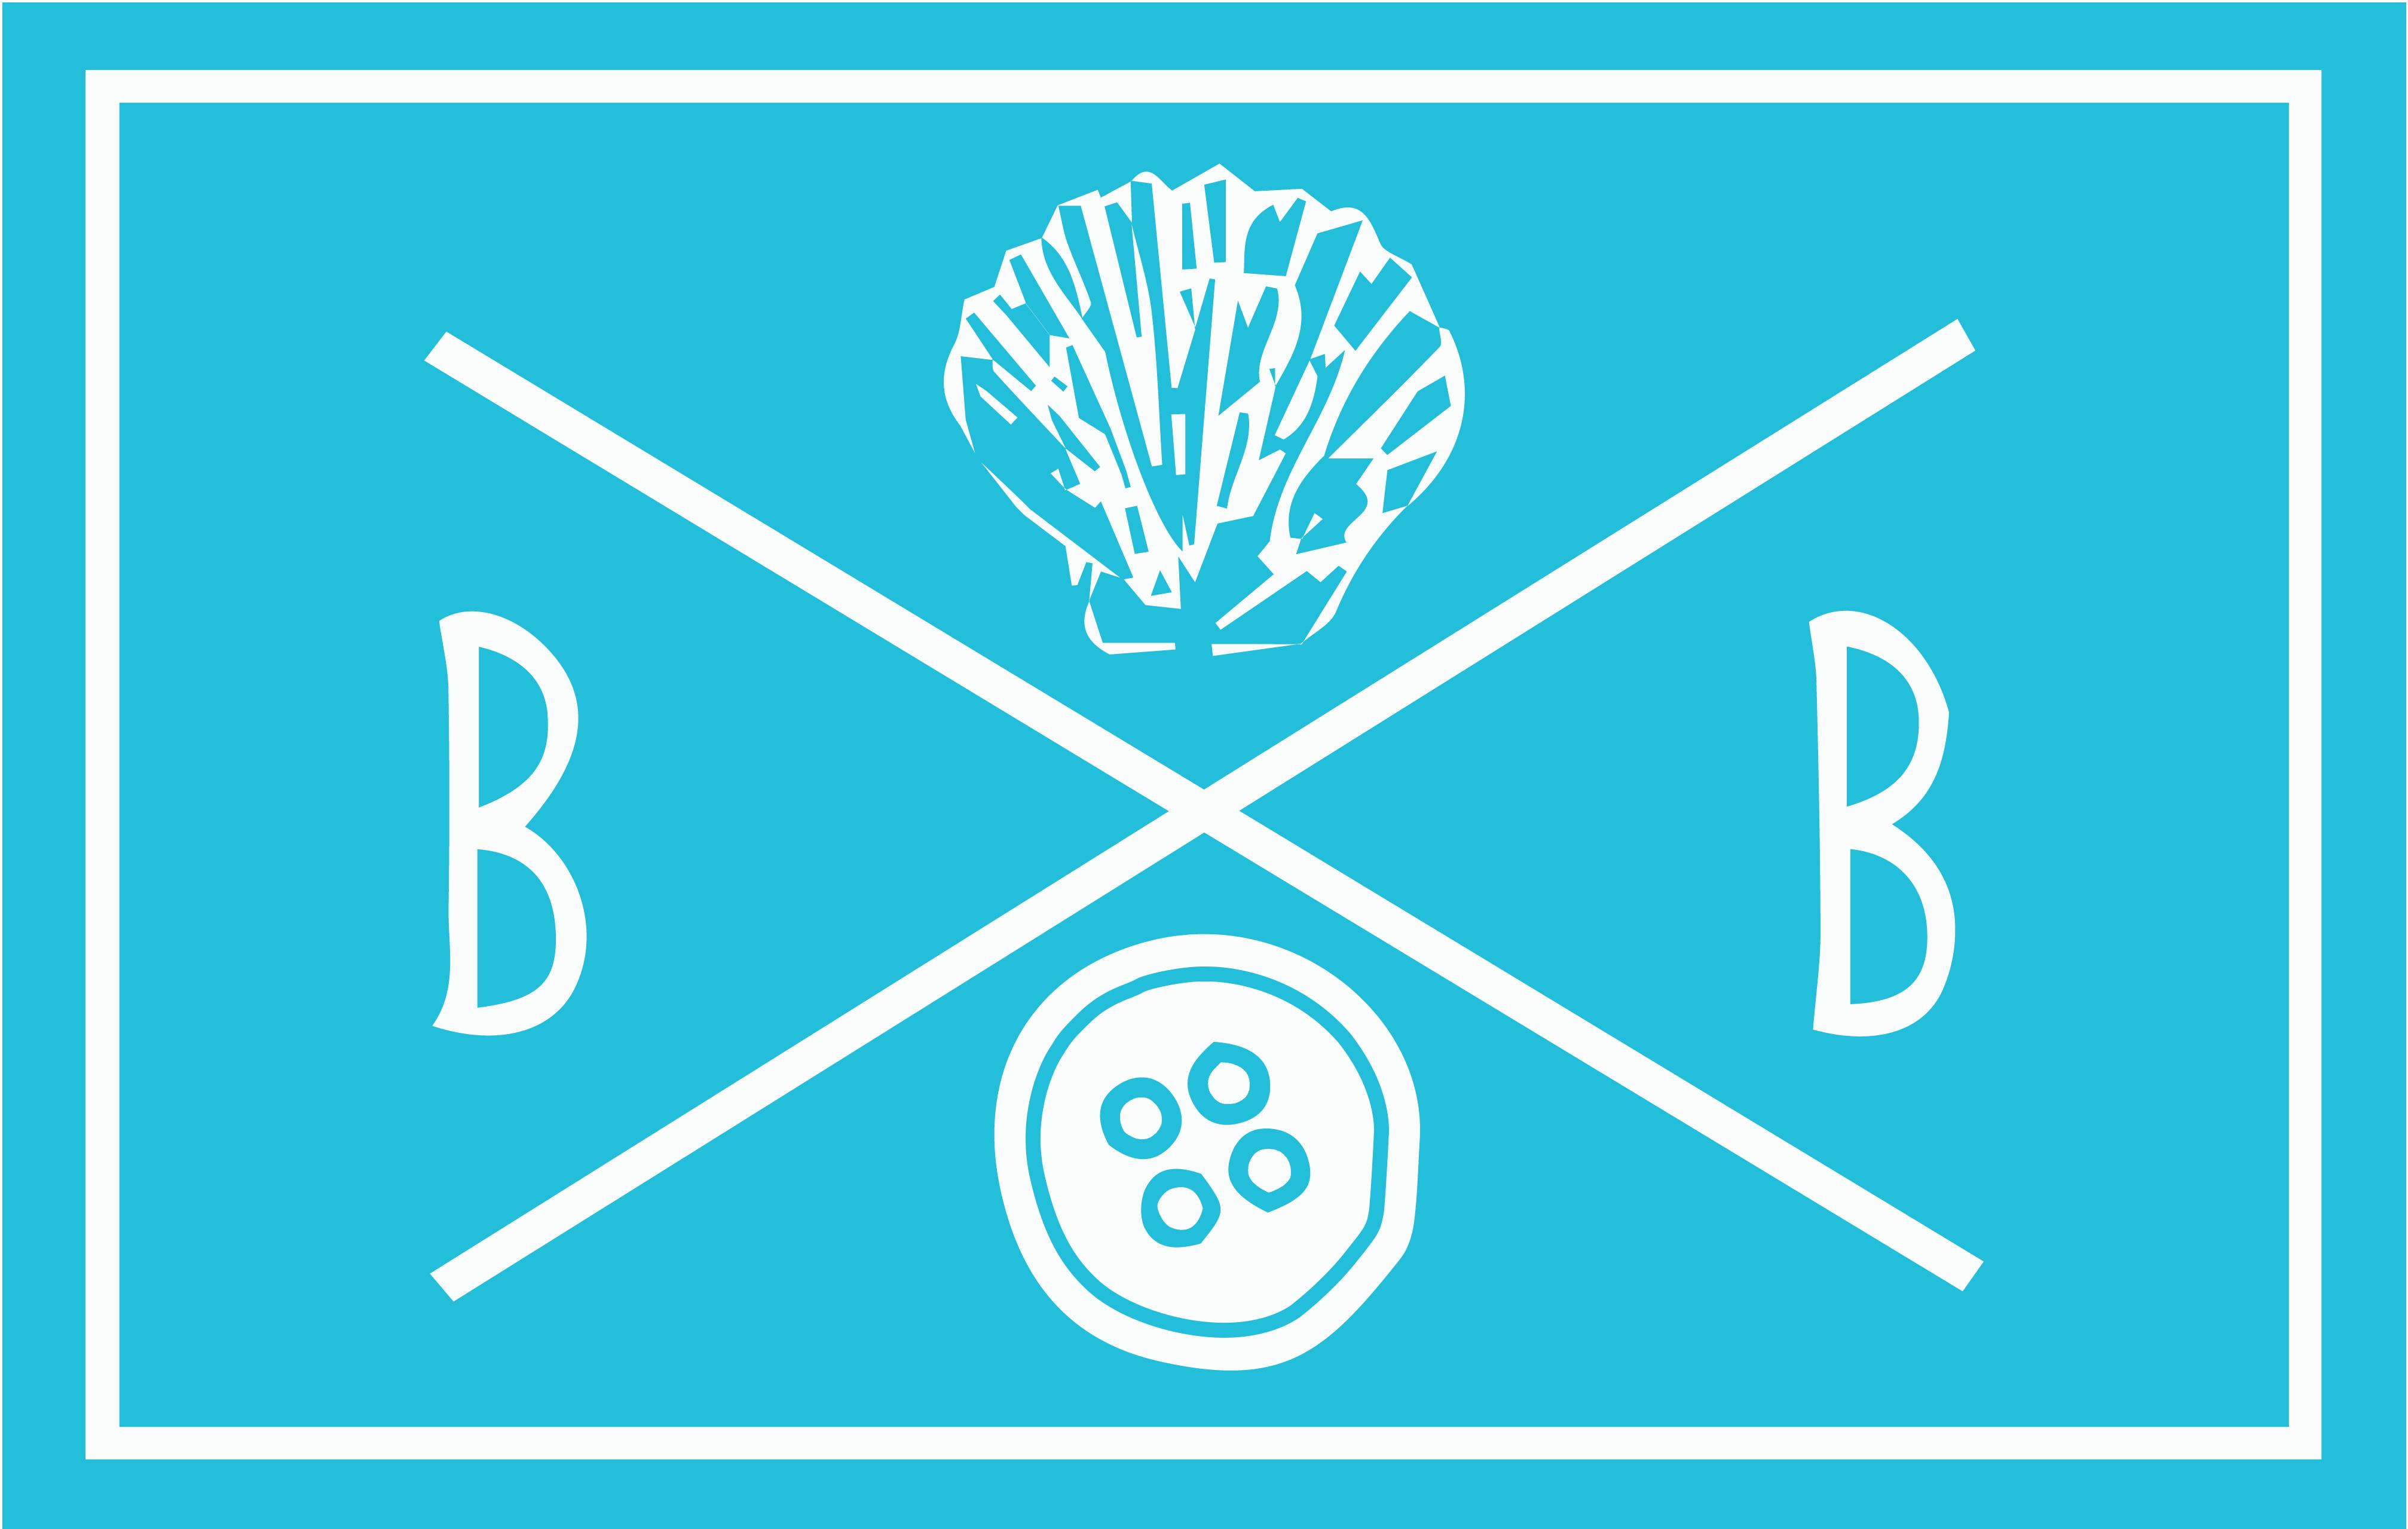 (c) Beckab.co.uk